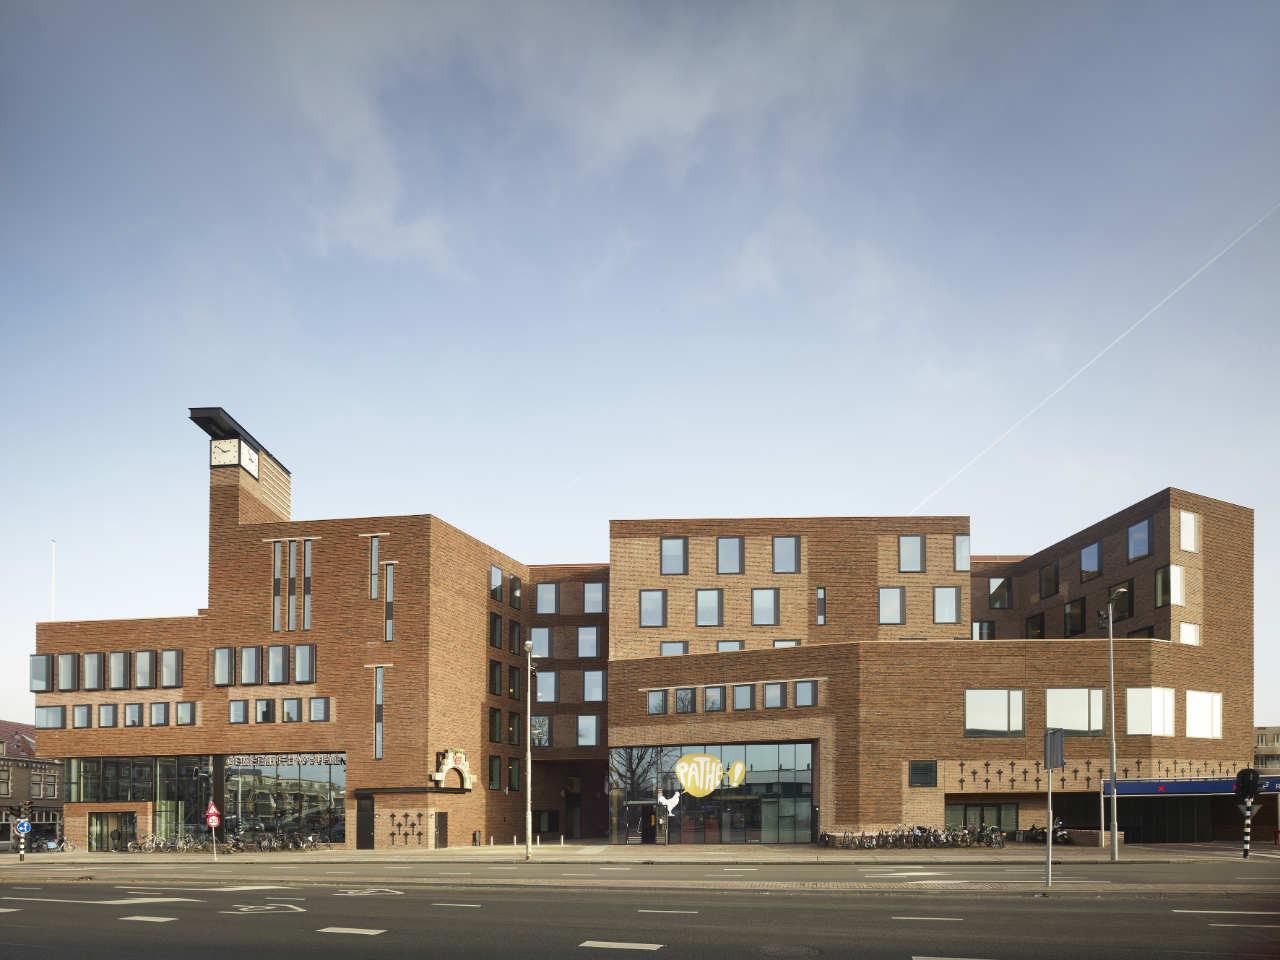 Raakspoort Haarlem / BOLLES+WILSON, © Christian Richters